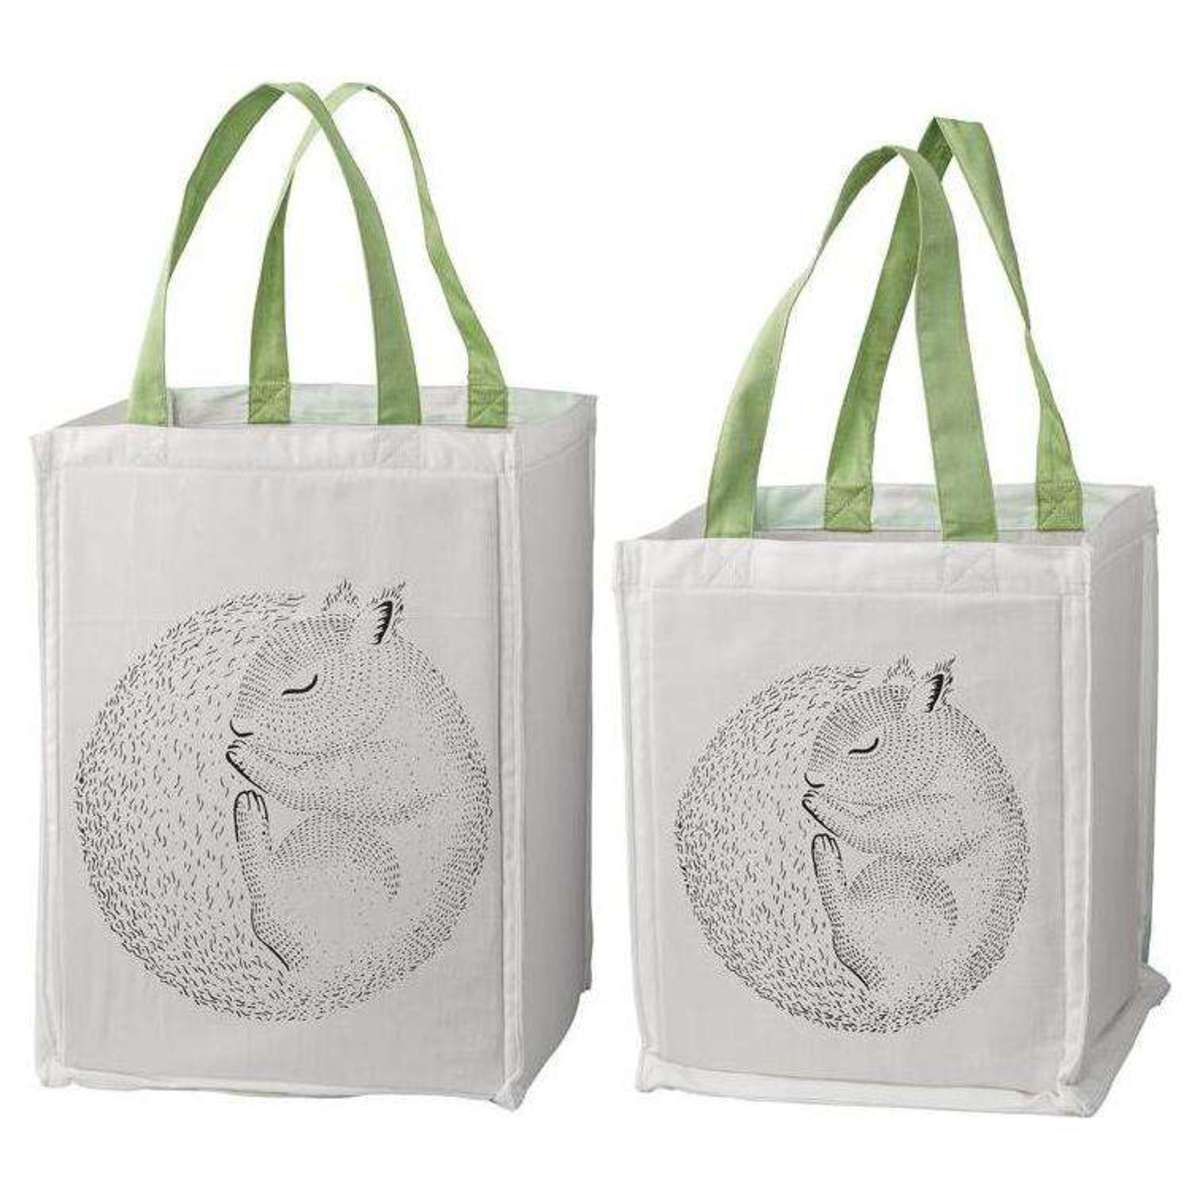 bloomingville lot de 2 sacs de rangement ecureuil rangement jouet bloomingville sur l. Black Bedroom Furniture Sets. Home Design Ideas